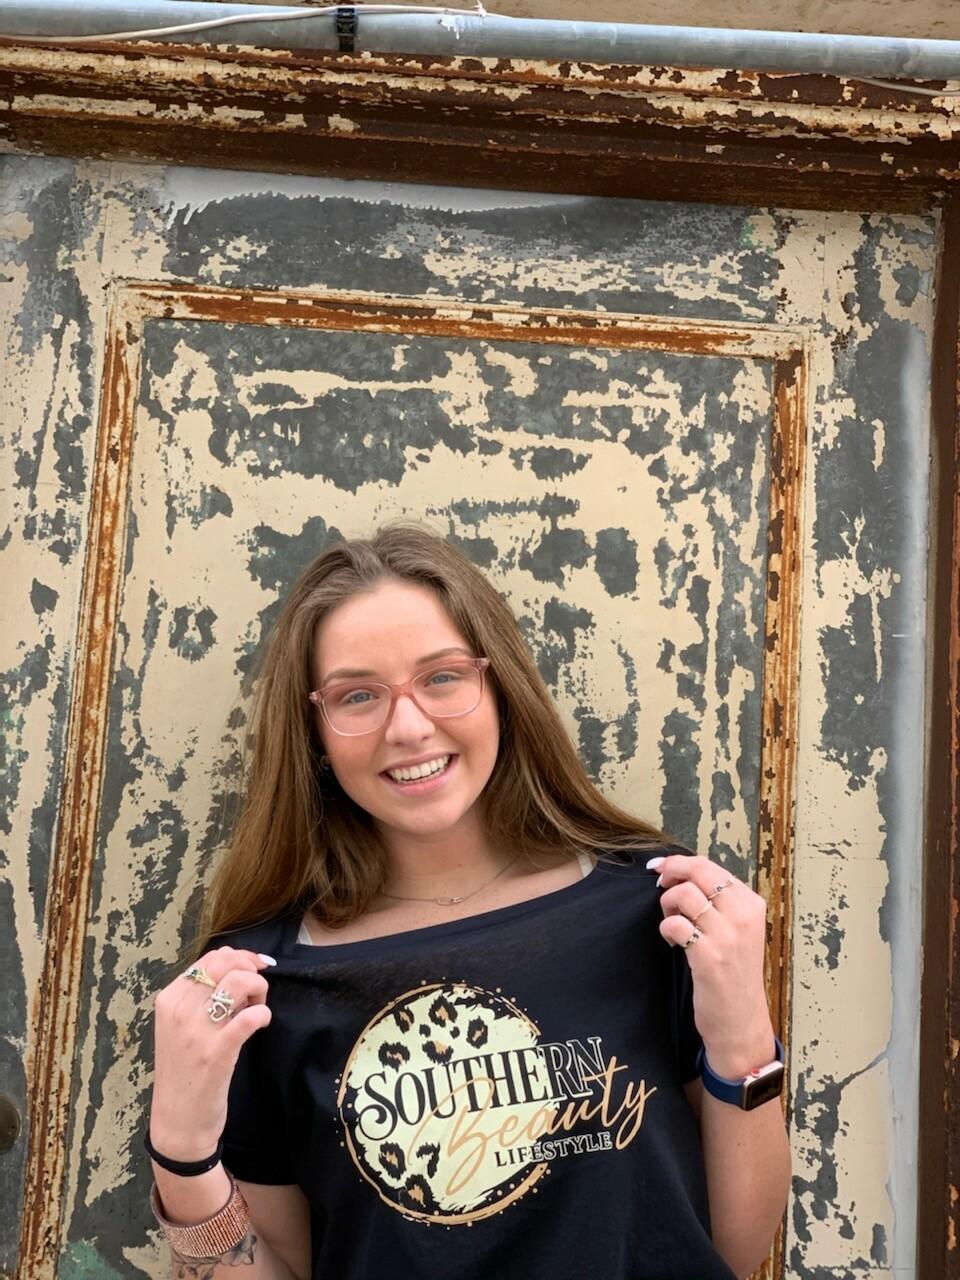 Next Level Black Roll Sleeve Southern Beauty Lifestyle Shirt